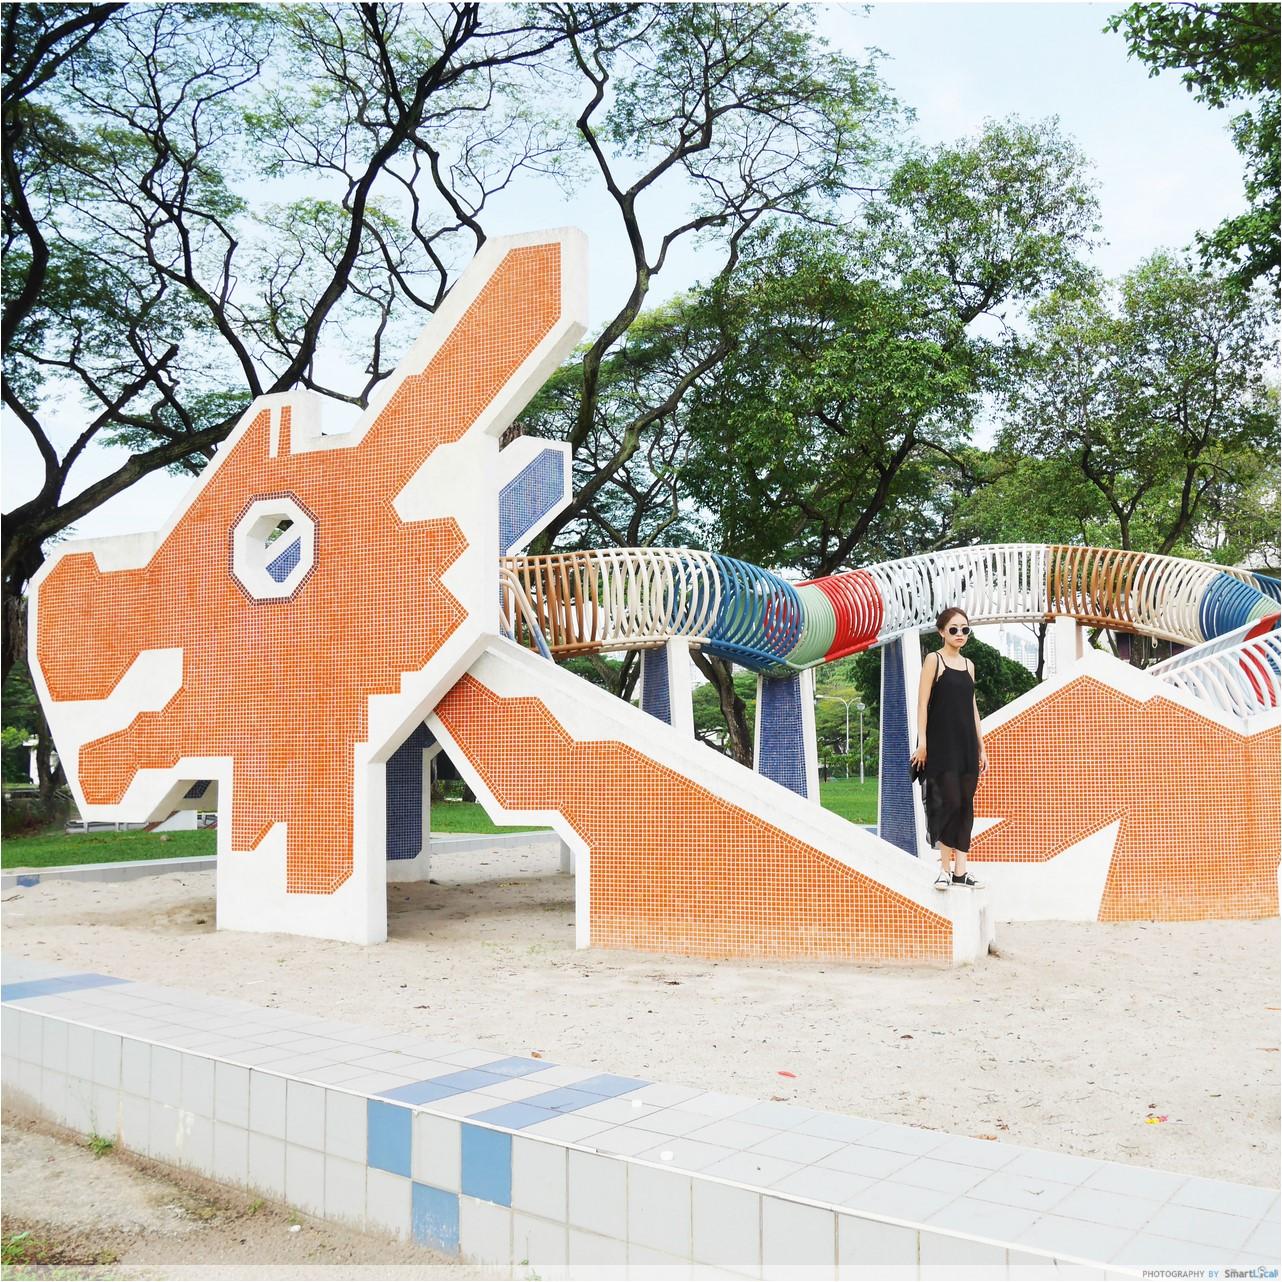 toa payoh playground